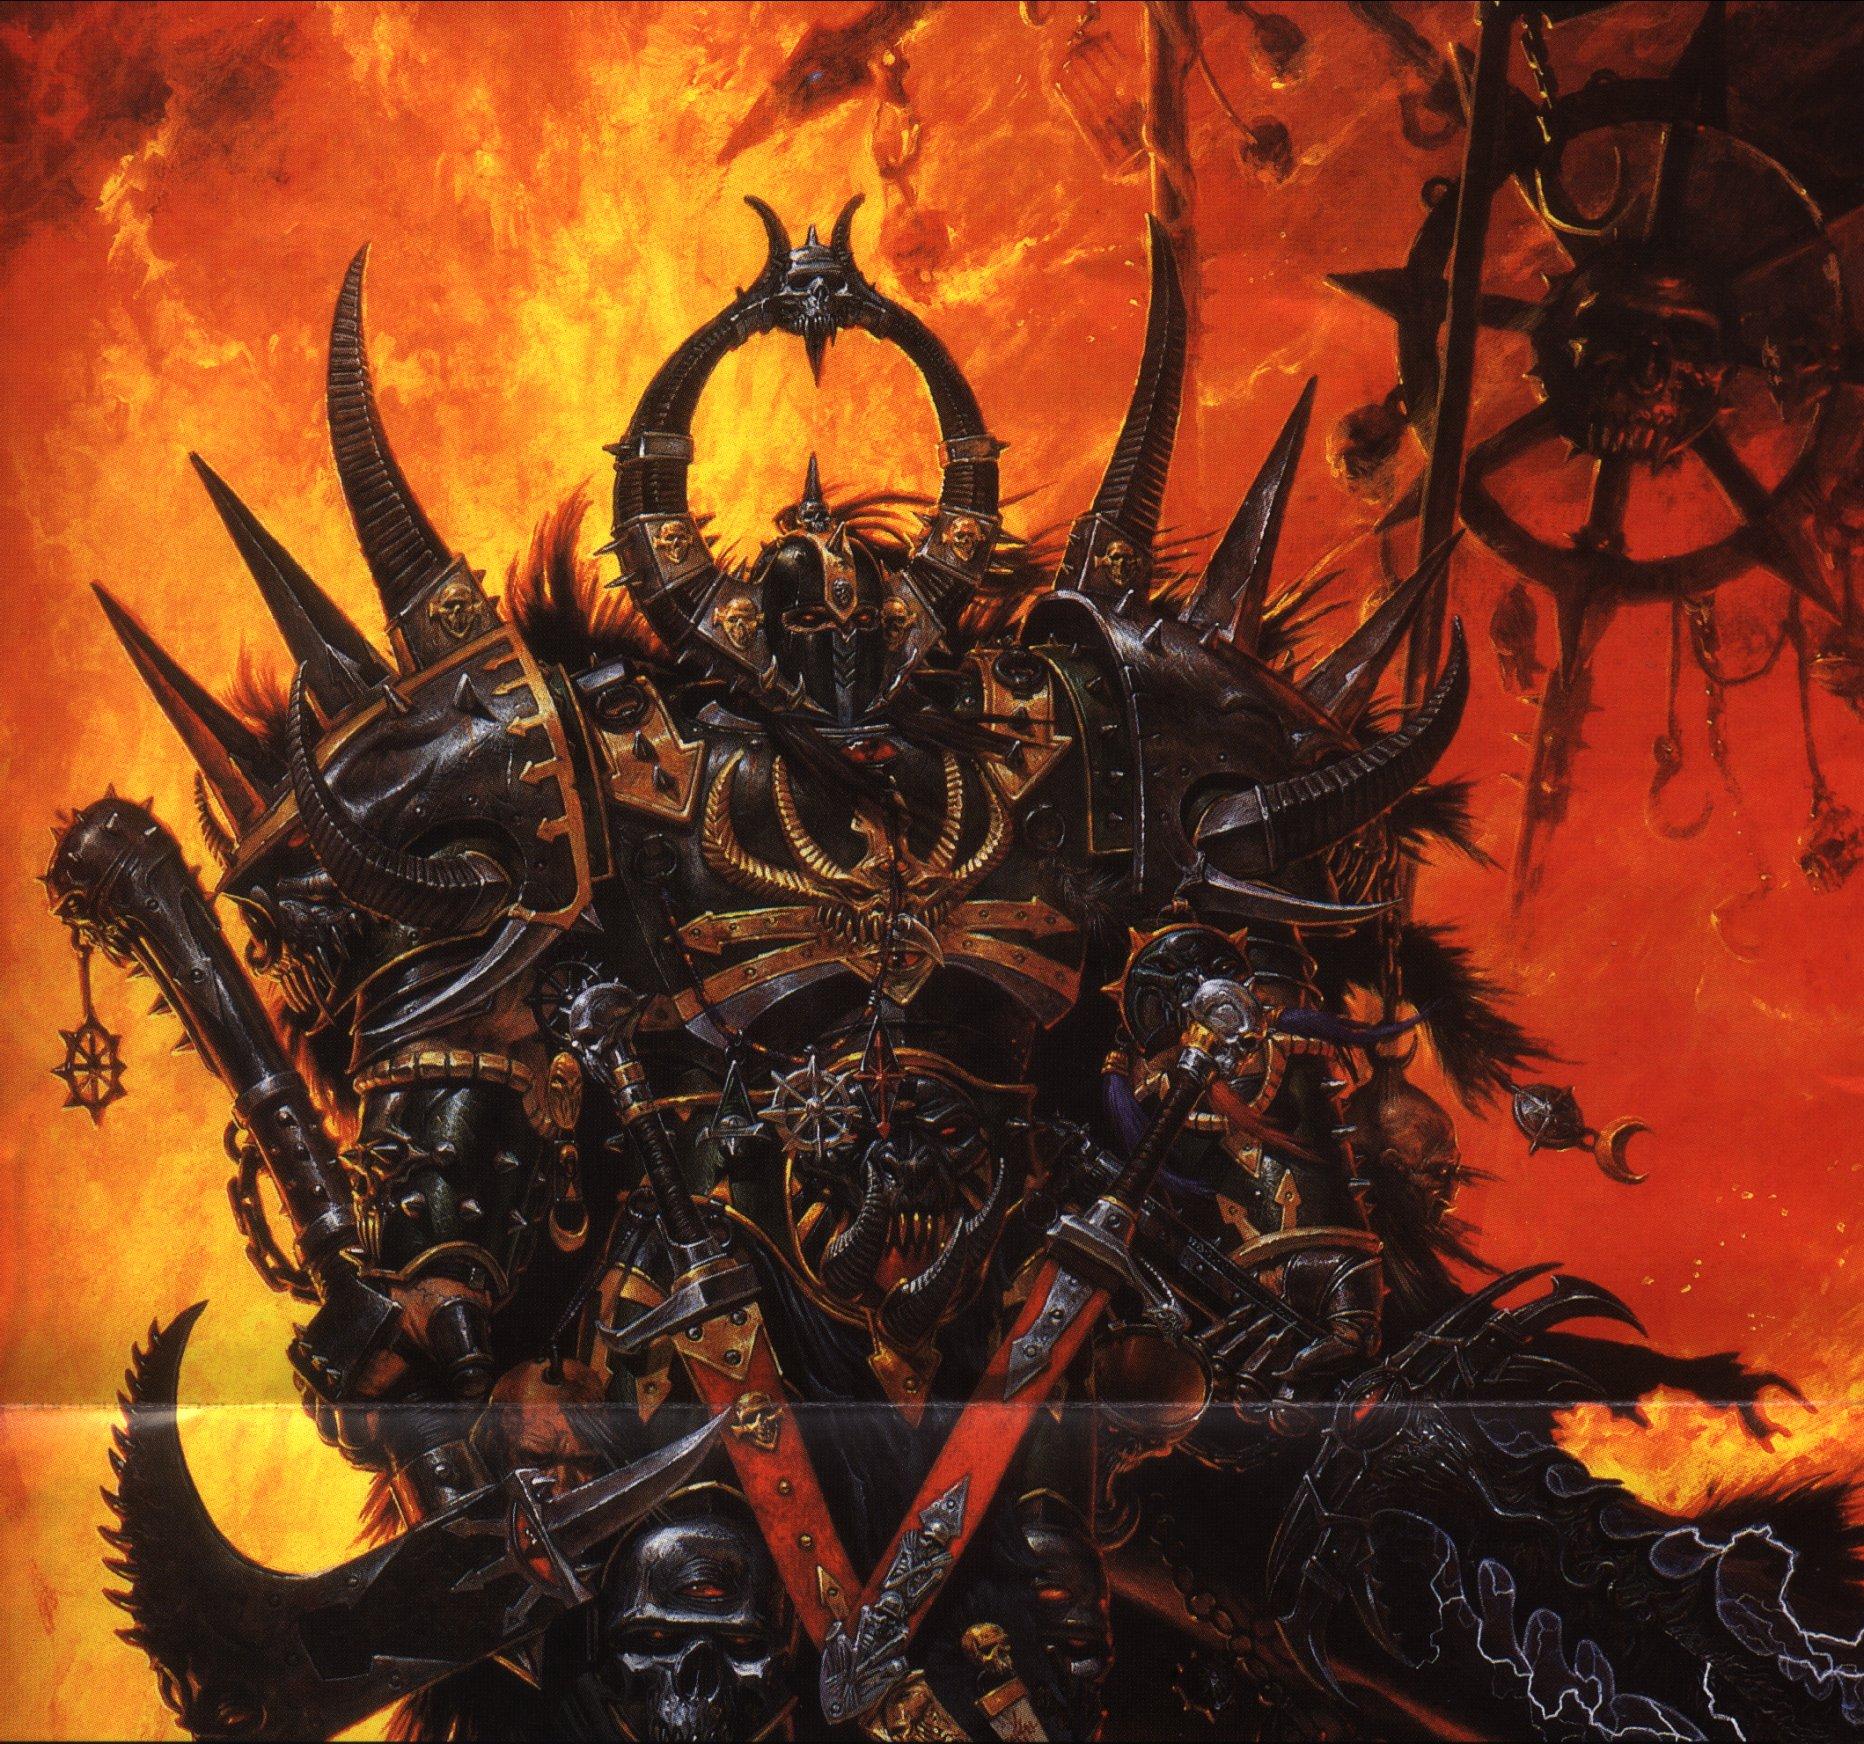 Warhammer 40k Chaos Wallpapers - Wallpaper Cave